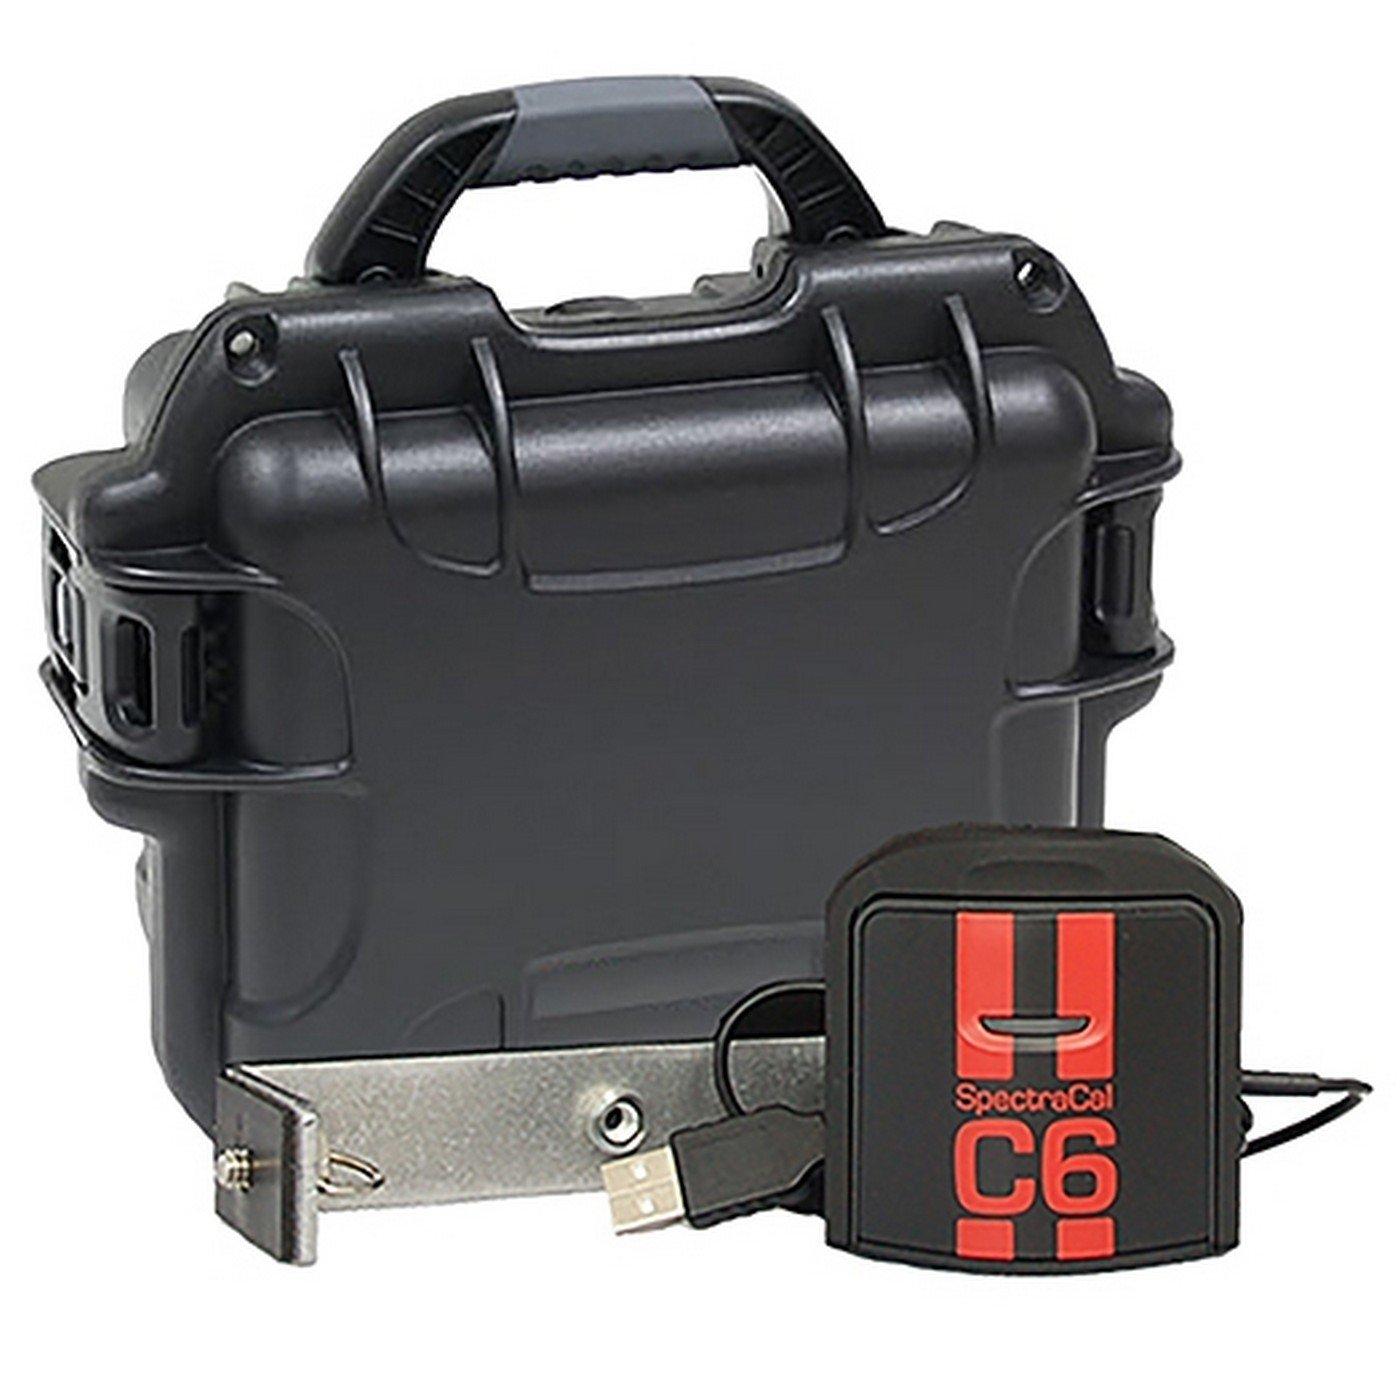 SpectraCal c6-hdr   Professional Calibratorライト測定Colorimeterハードウェアのみ   B017HWL7IW